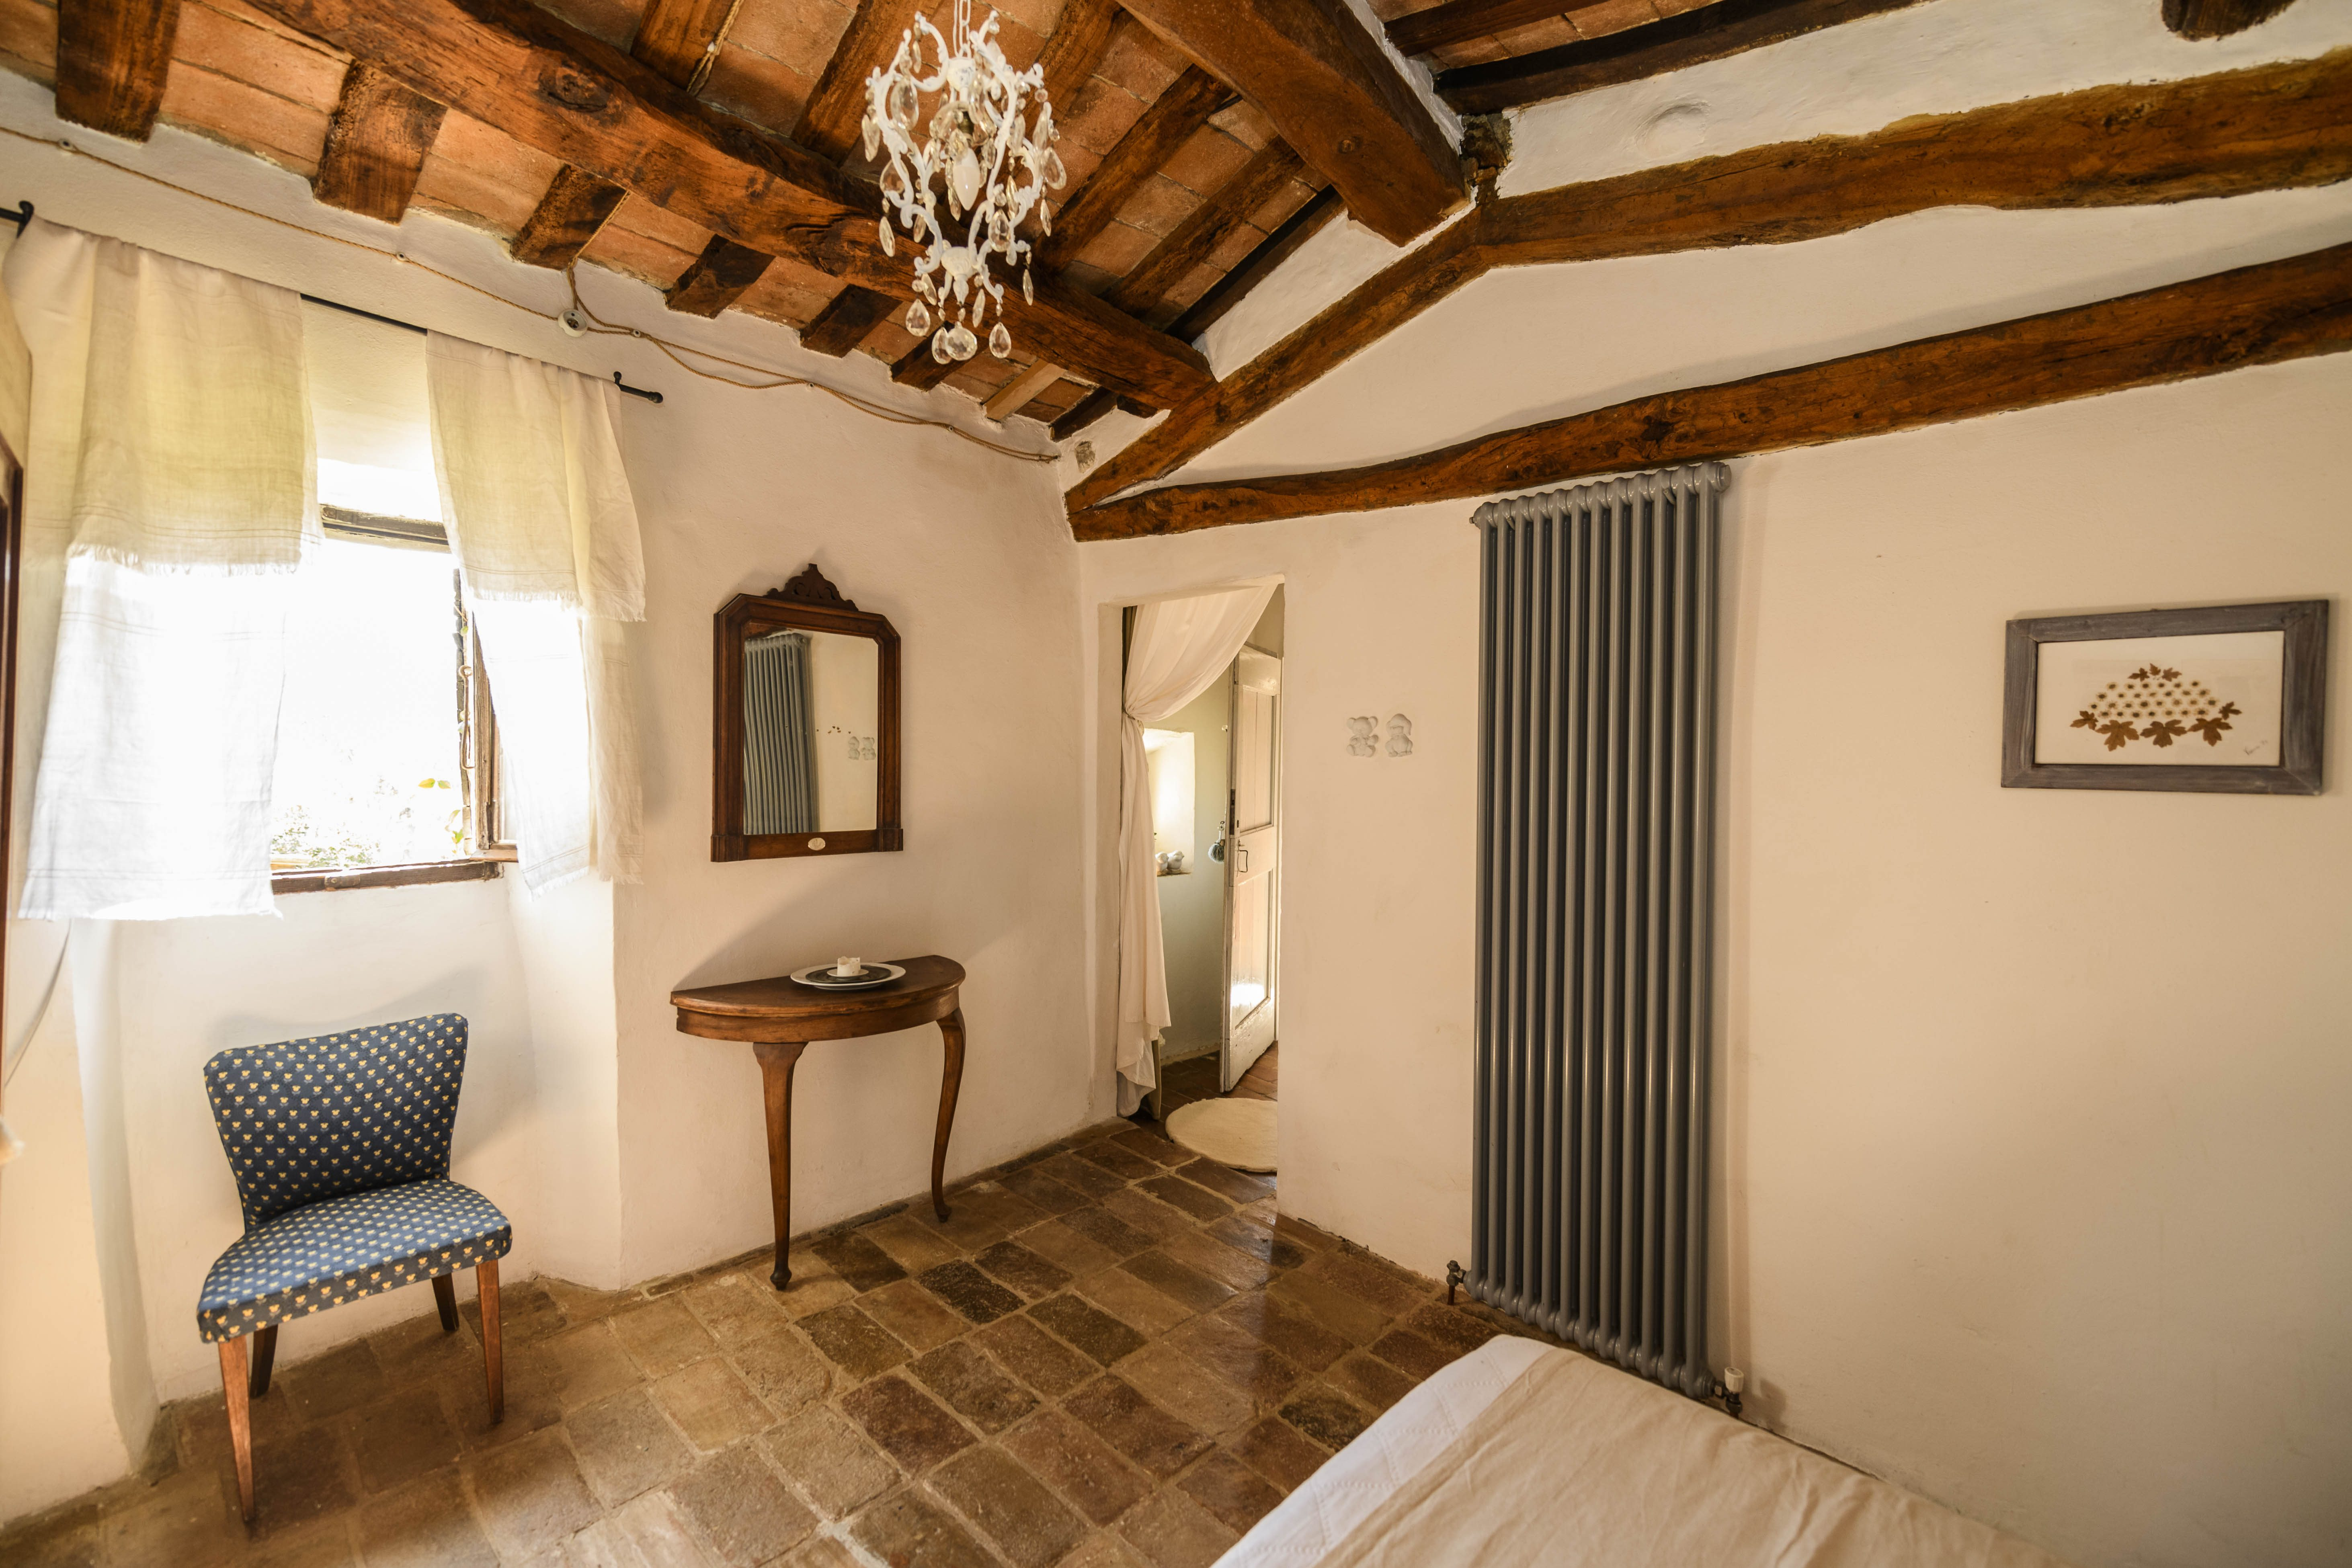 Camera del Gelsomino